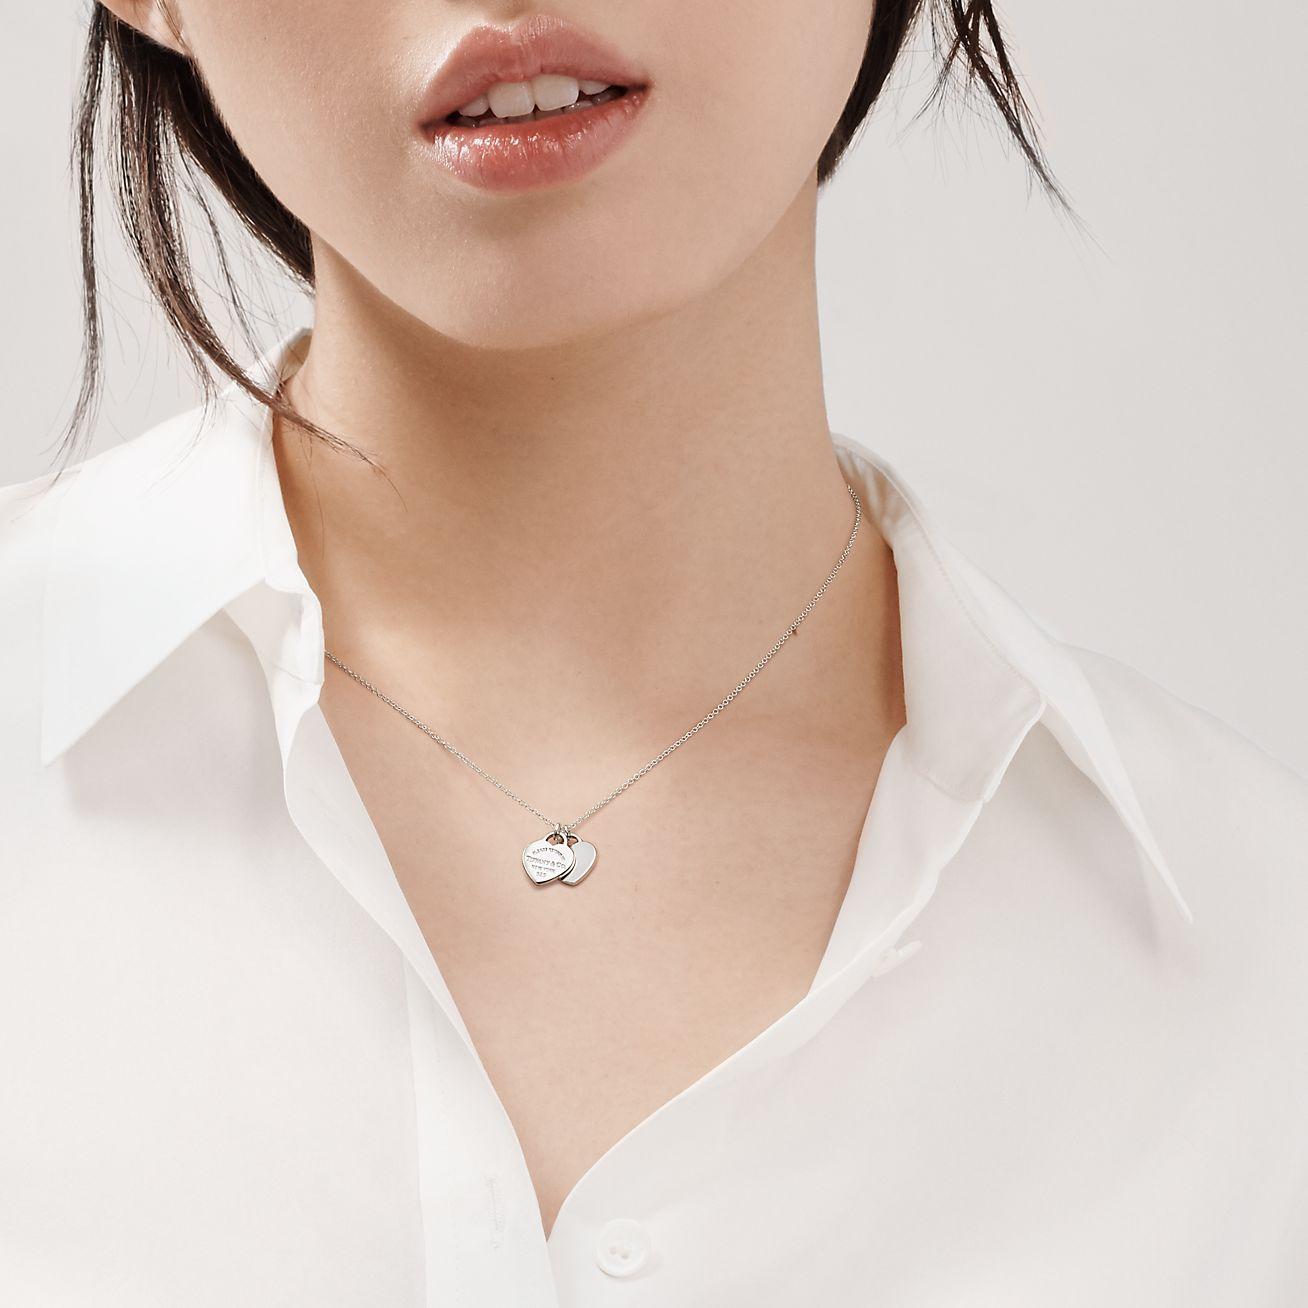 Dubble heart earrings and heart in key charm necklace silver